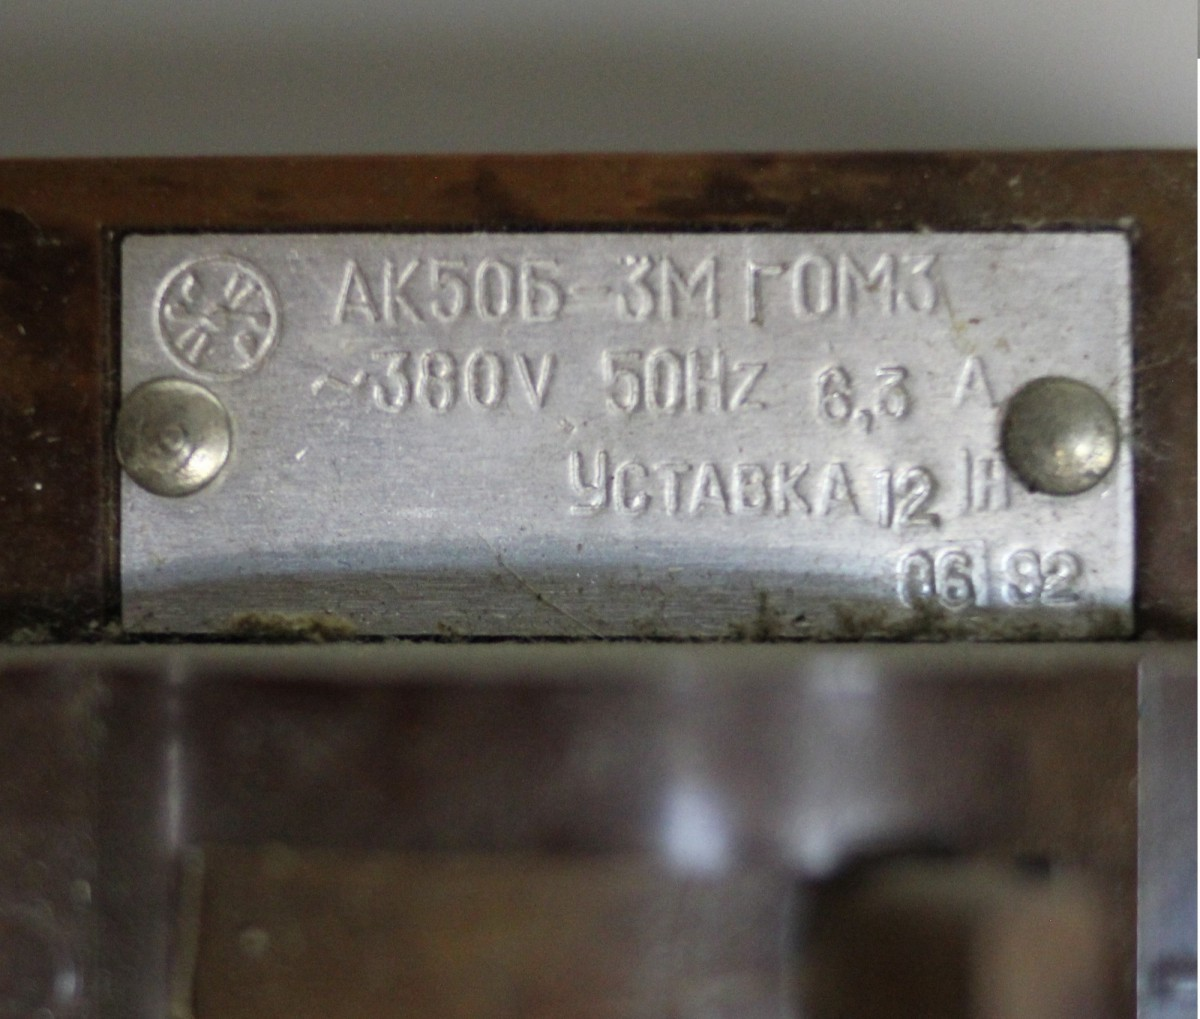 Автомат АК 50-3 6,3 А (12)